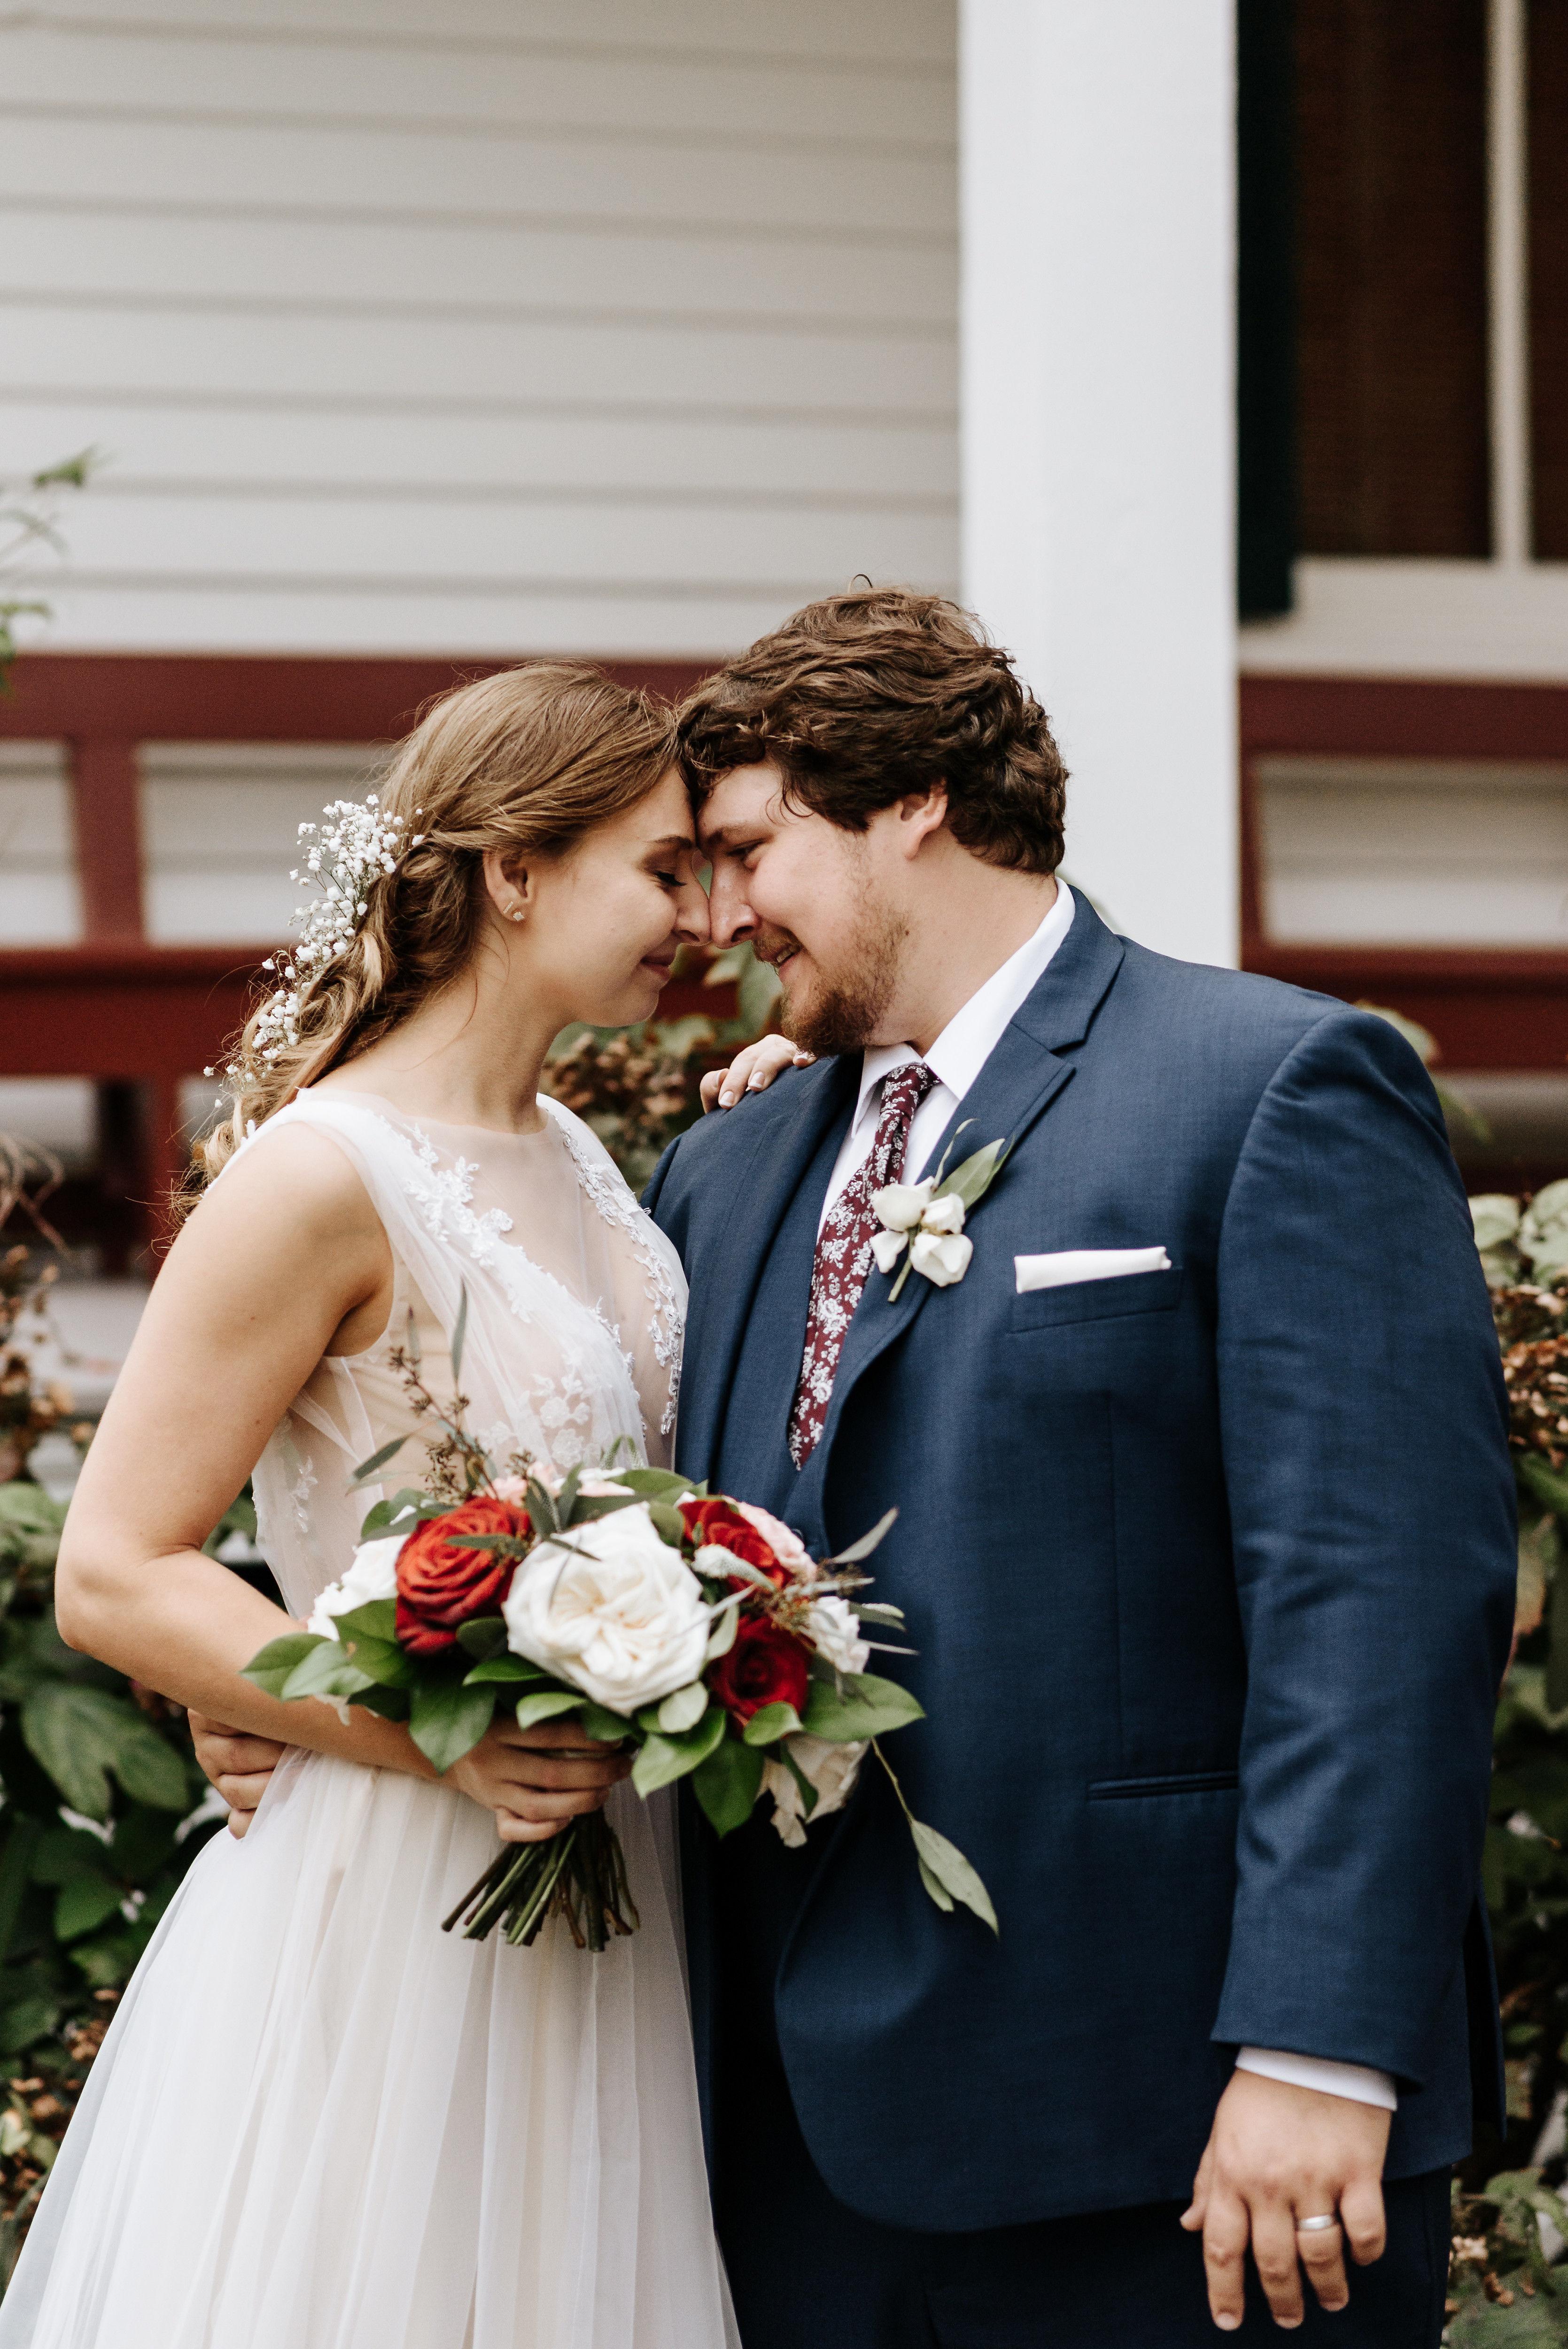 Hanover_Tavern_Wedding_Tori_Jared_Photography_by_V_1865